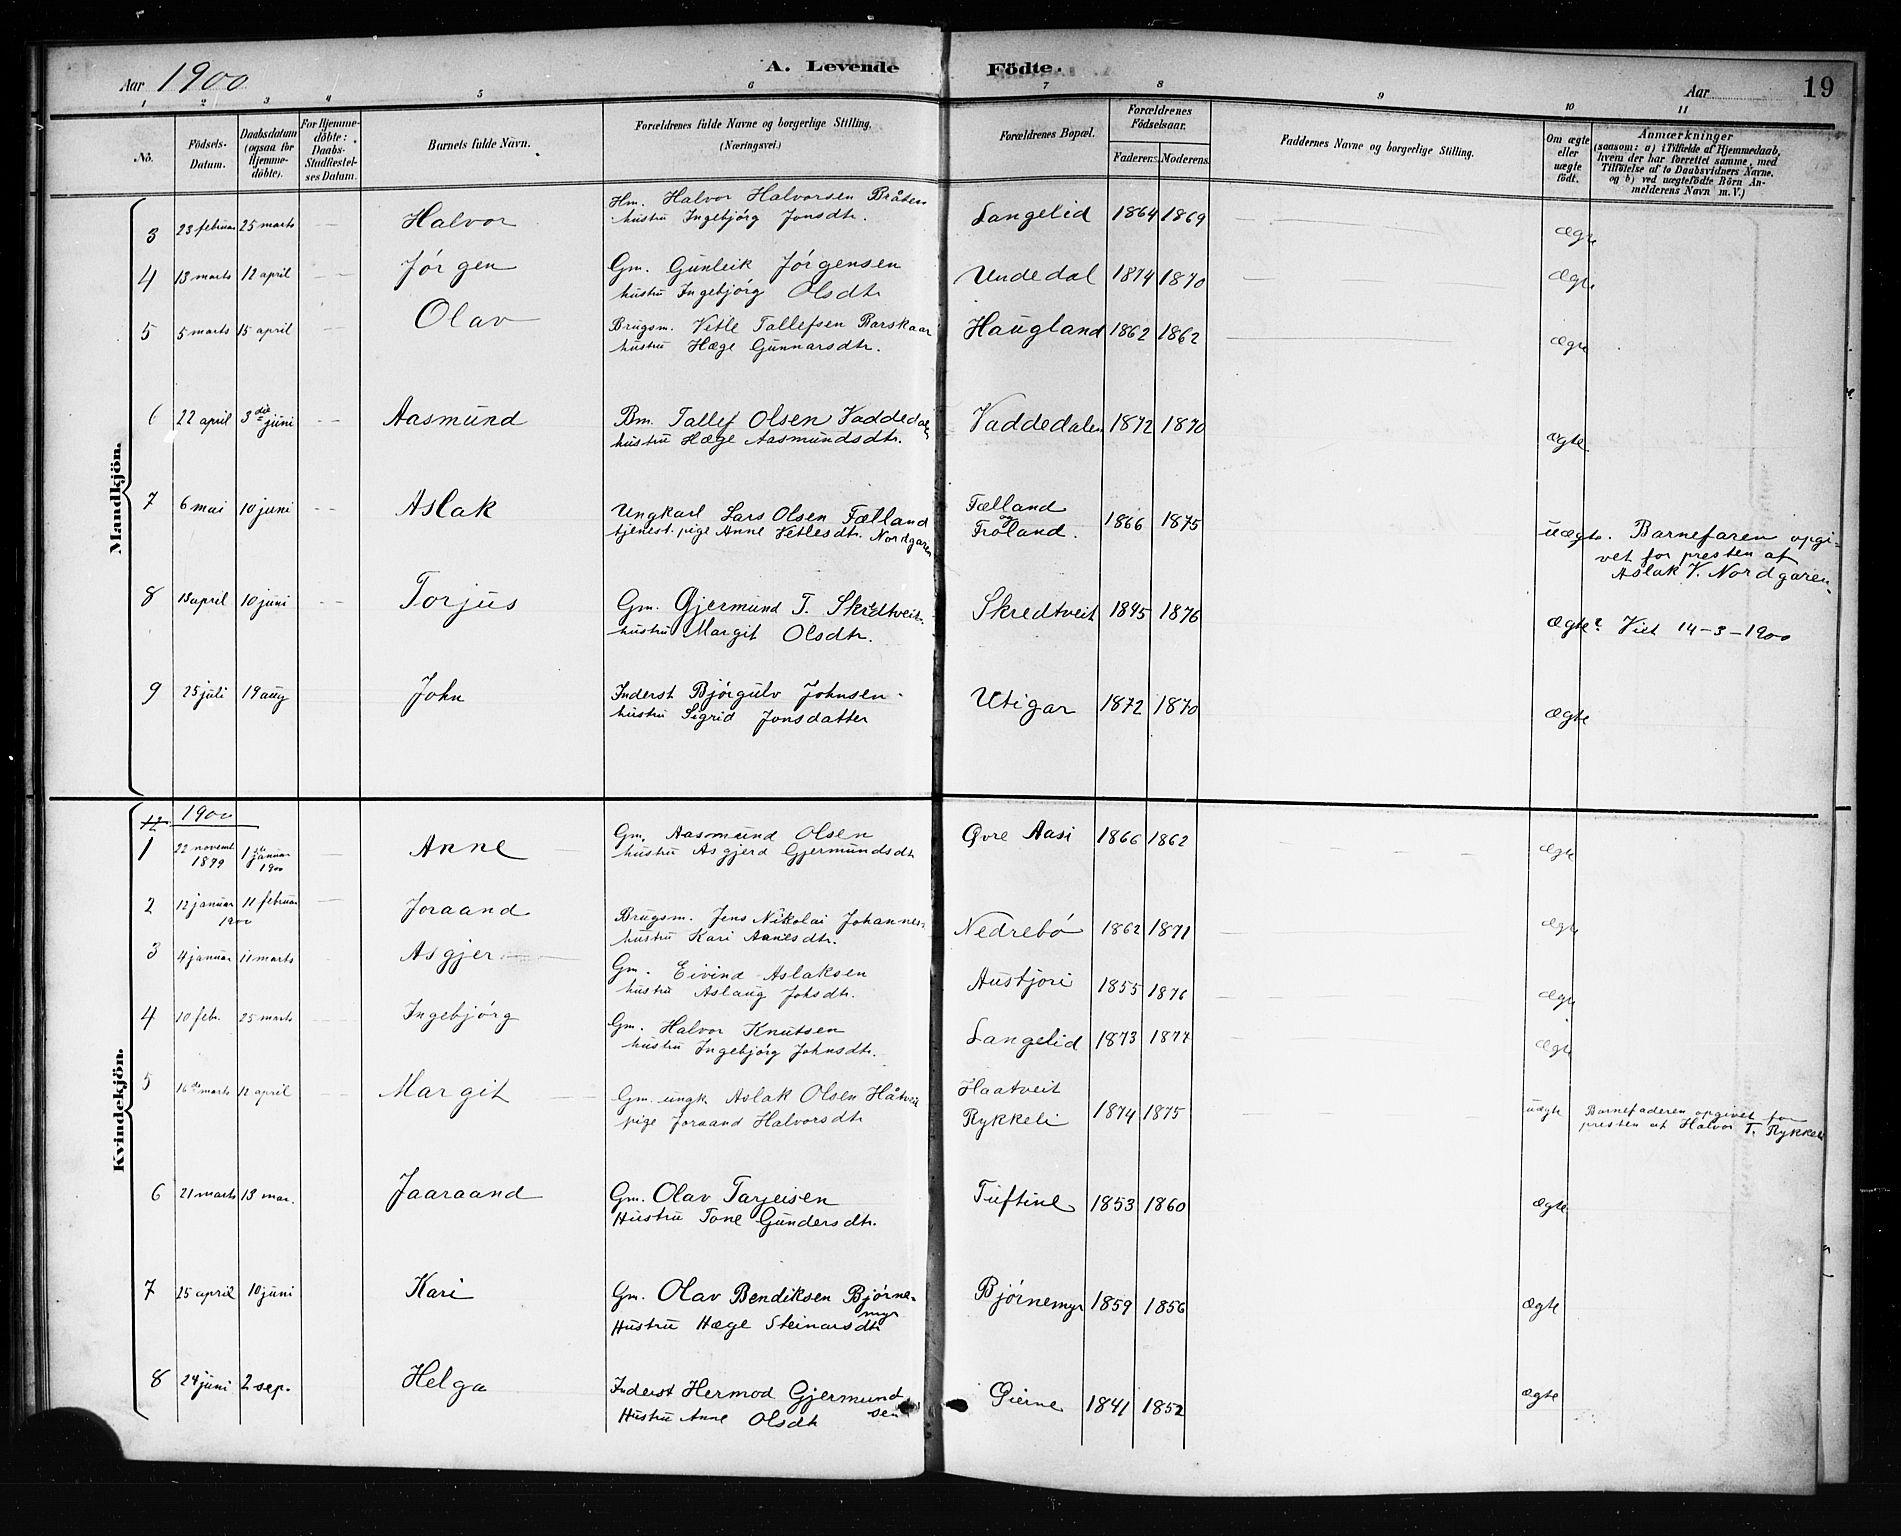 SAKO, Mo kirkebøker, G/Ga/L0002: Klokkerbok nr. I 2, 1892-1914, s. 19